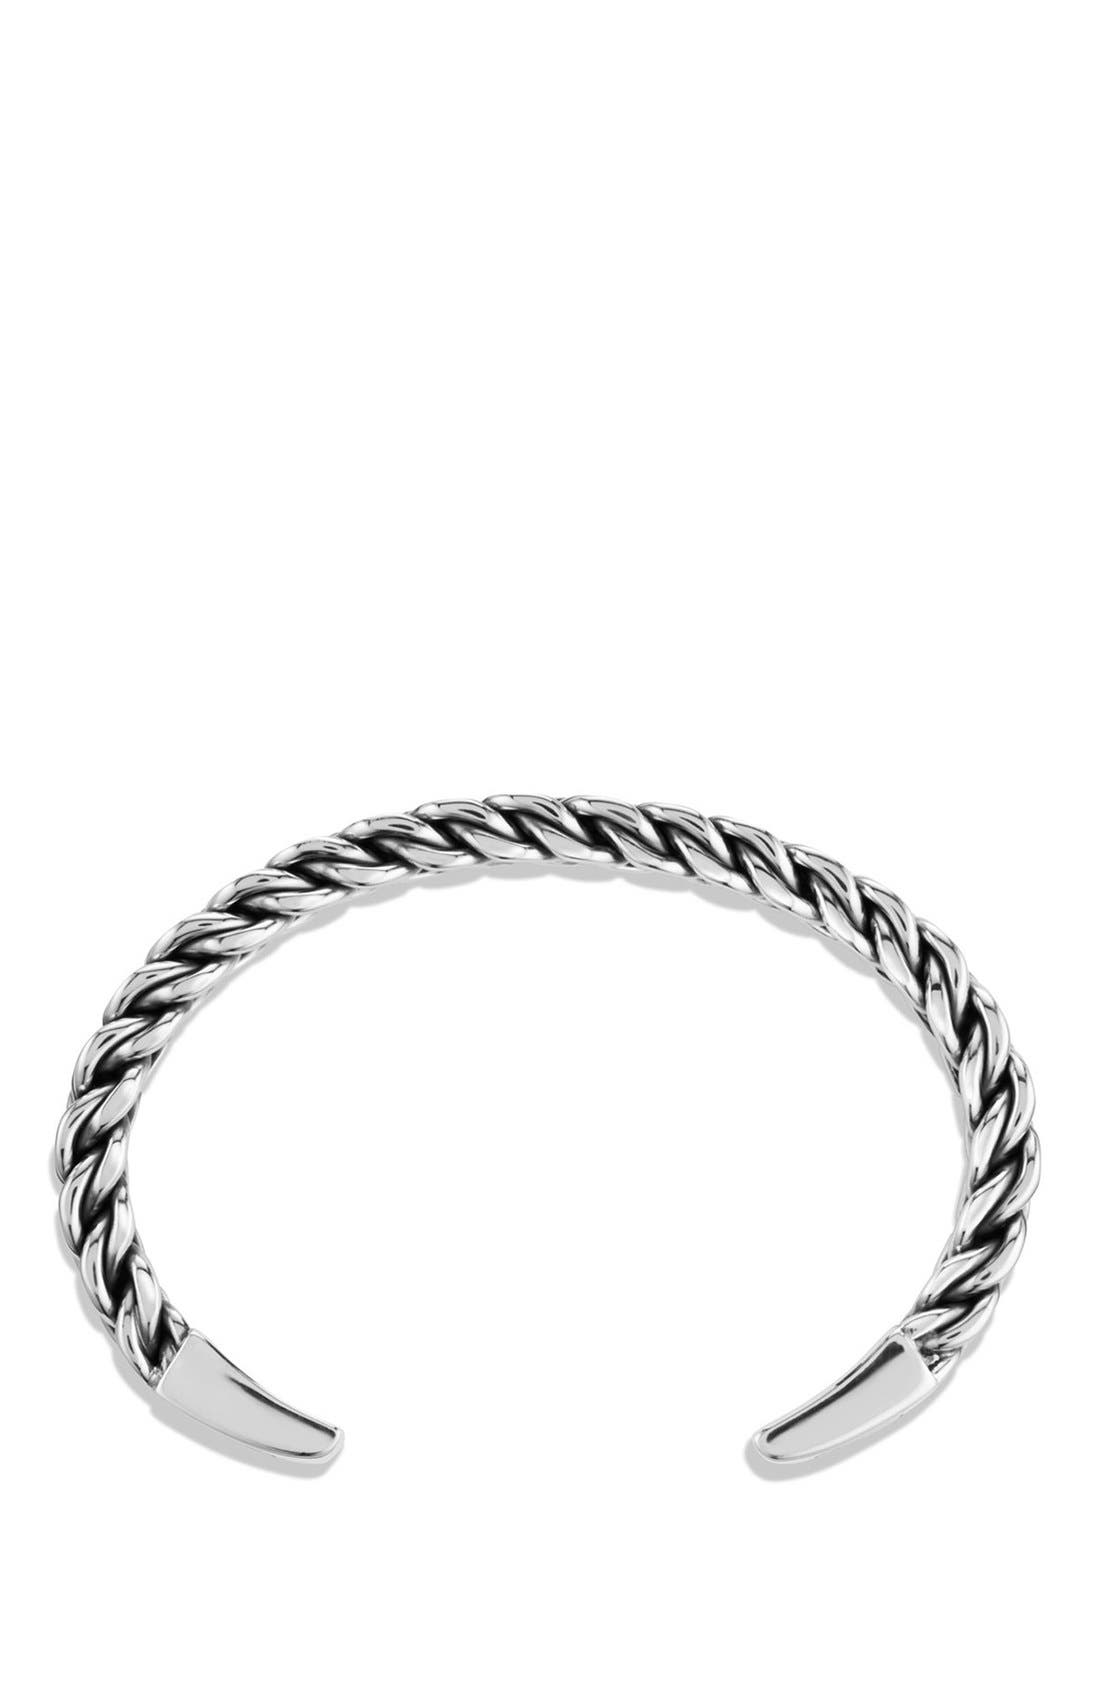 'Chain' Woven Cuff Bracelet,                             Alternate thumbnail 2, color,                             SILVER